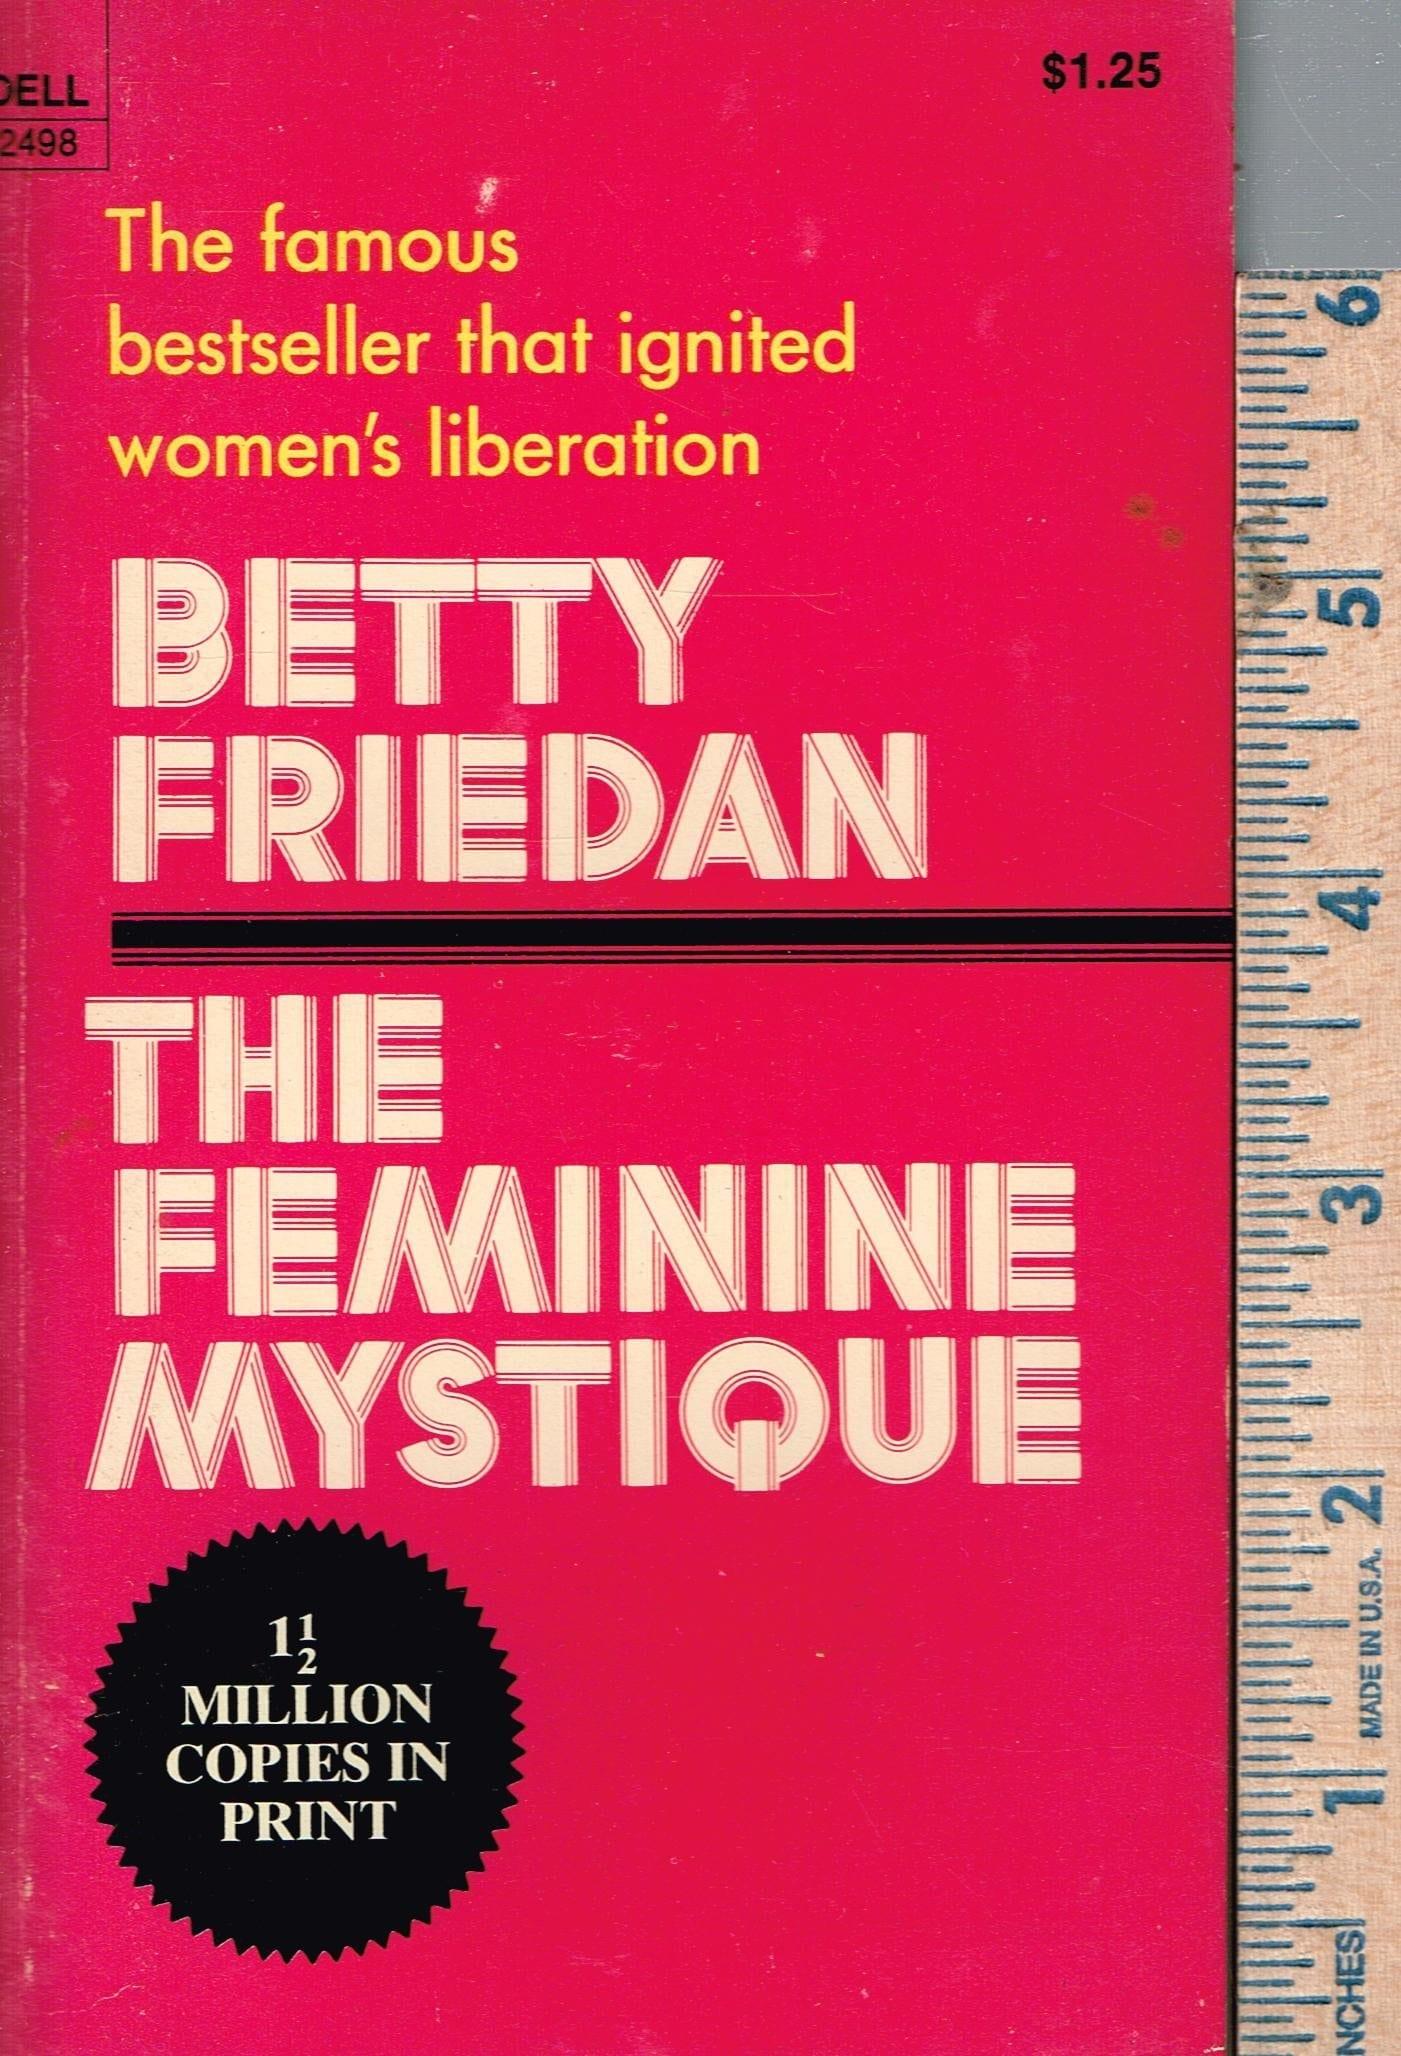 The Feminine Mystique by Betty Friedan